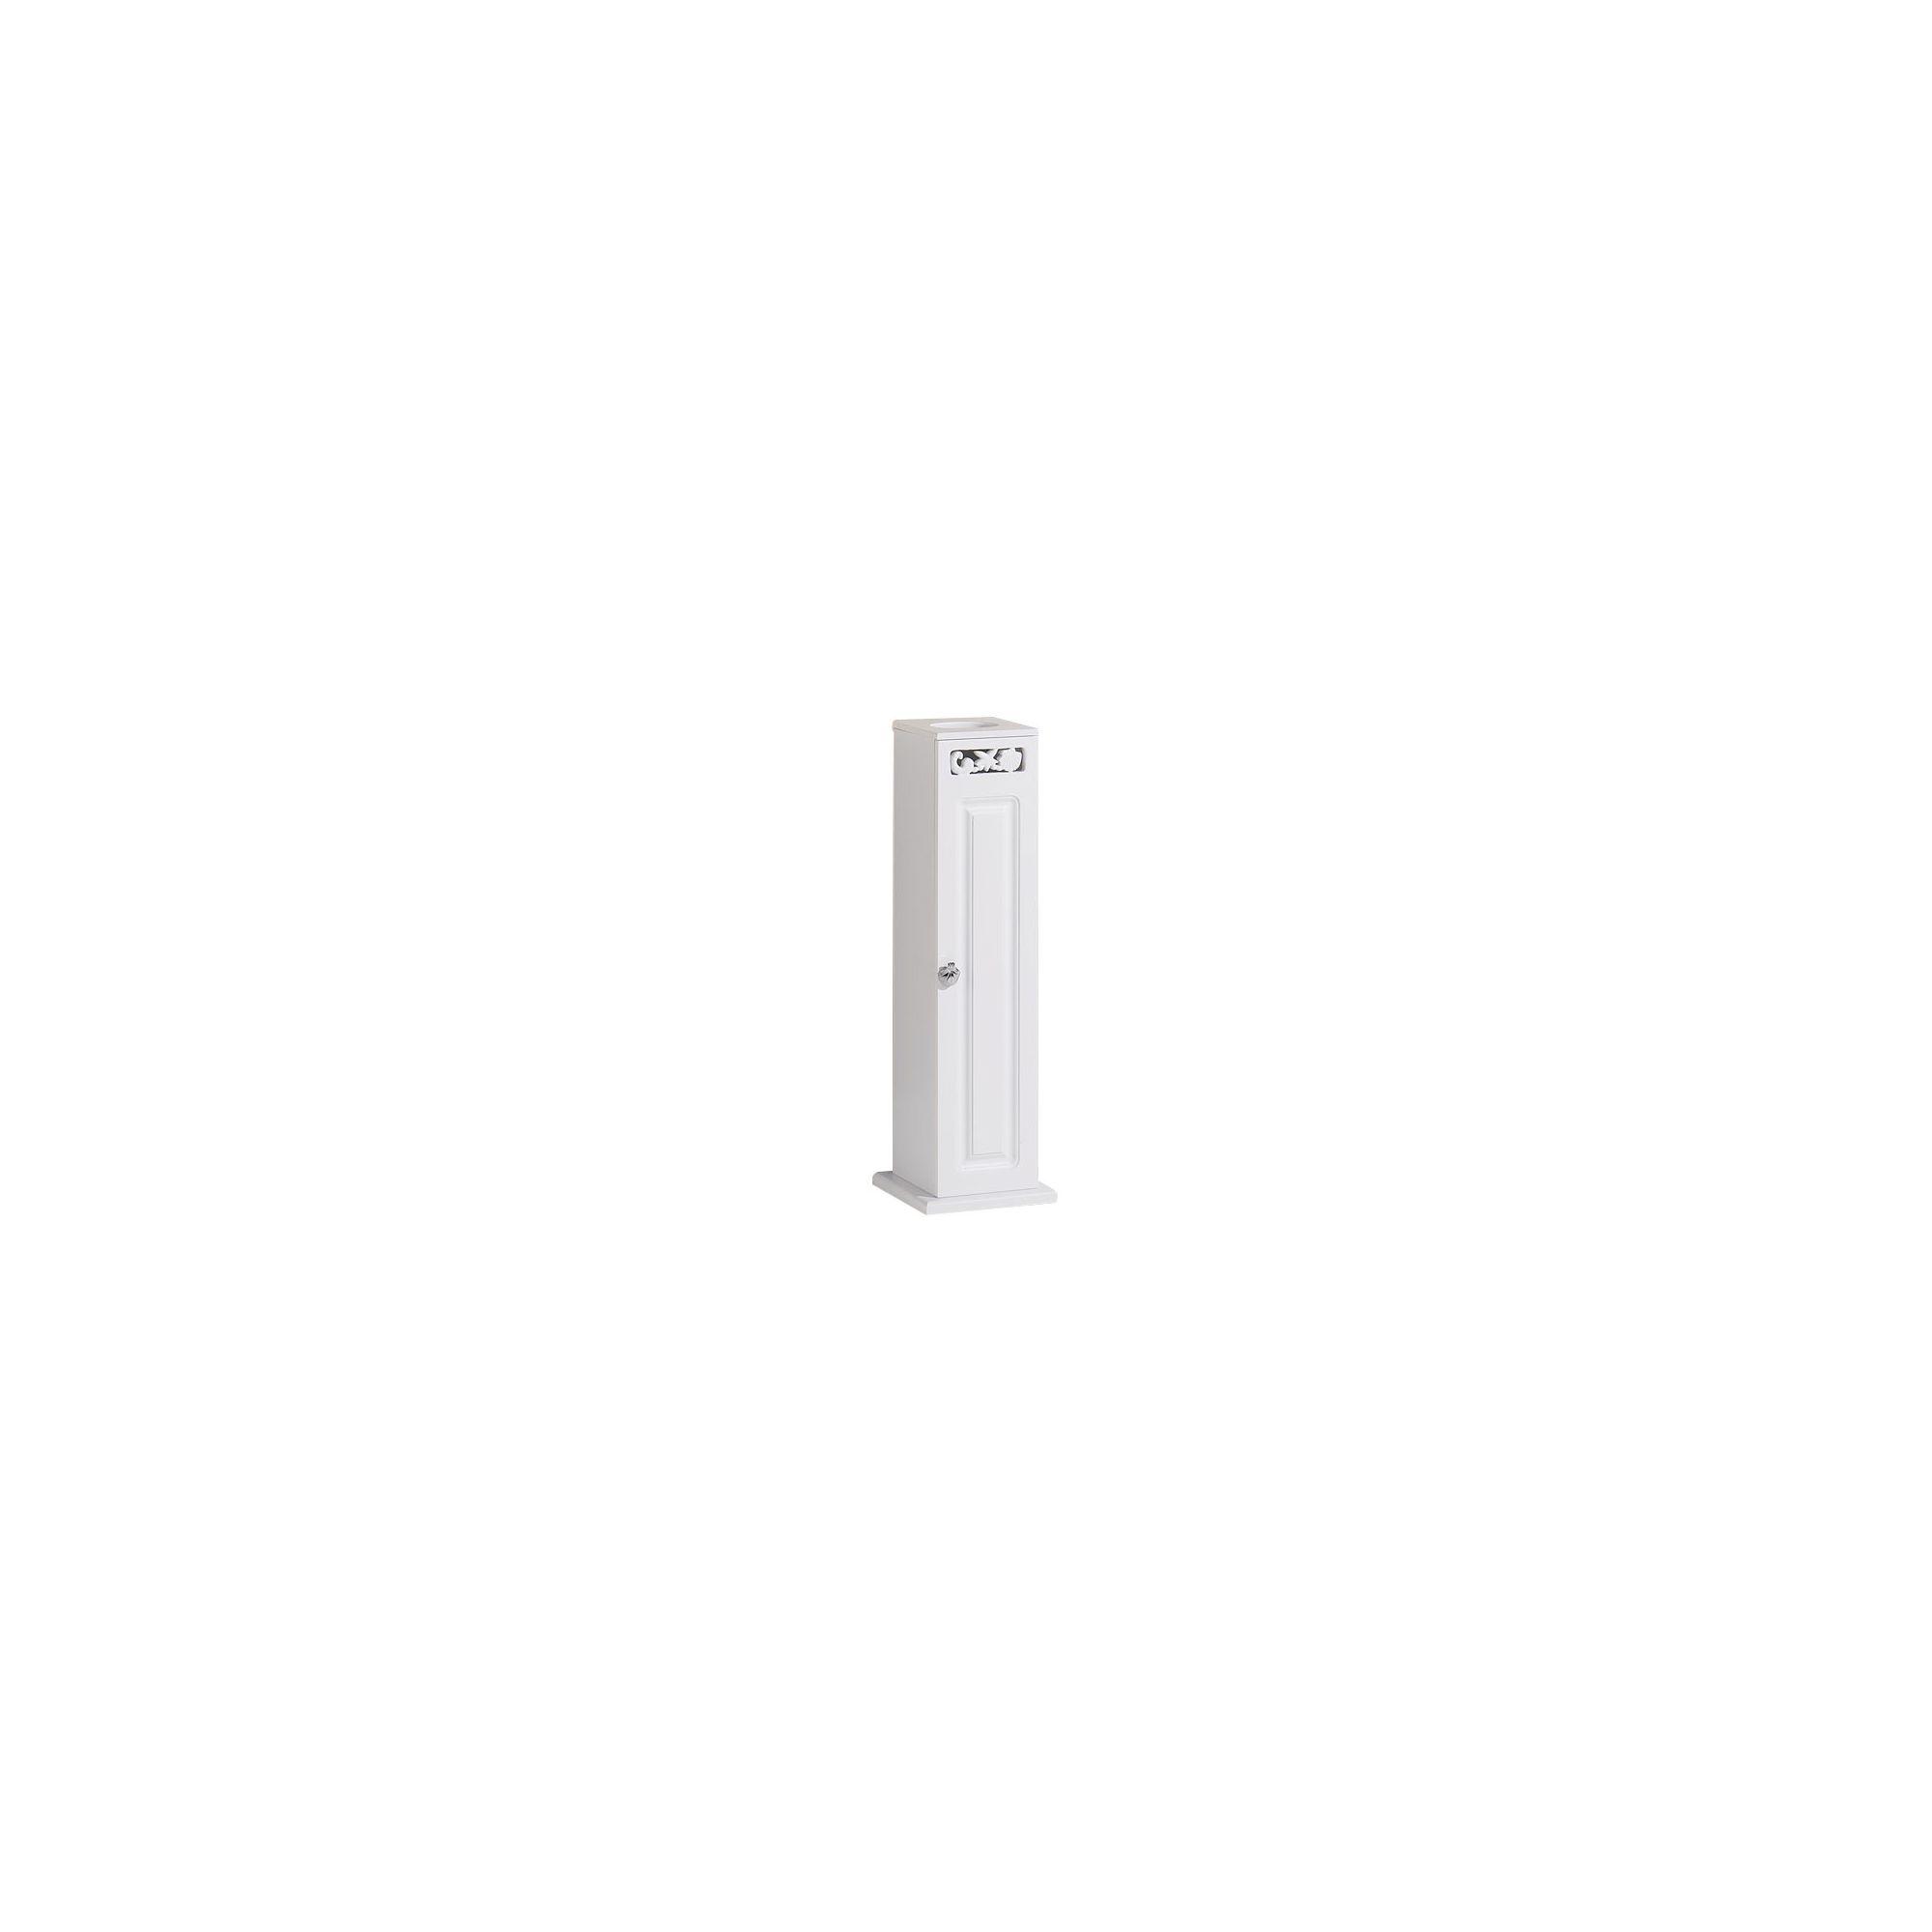 Mountrose Corella Toilet Roll Cupboard in White